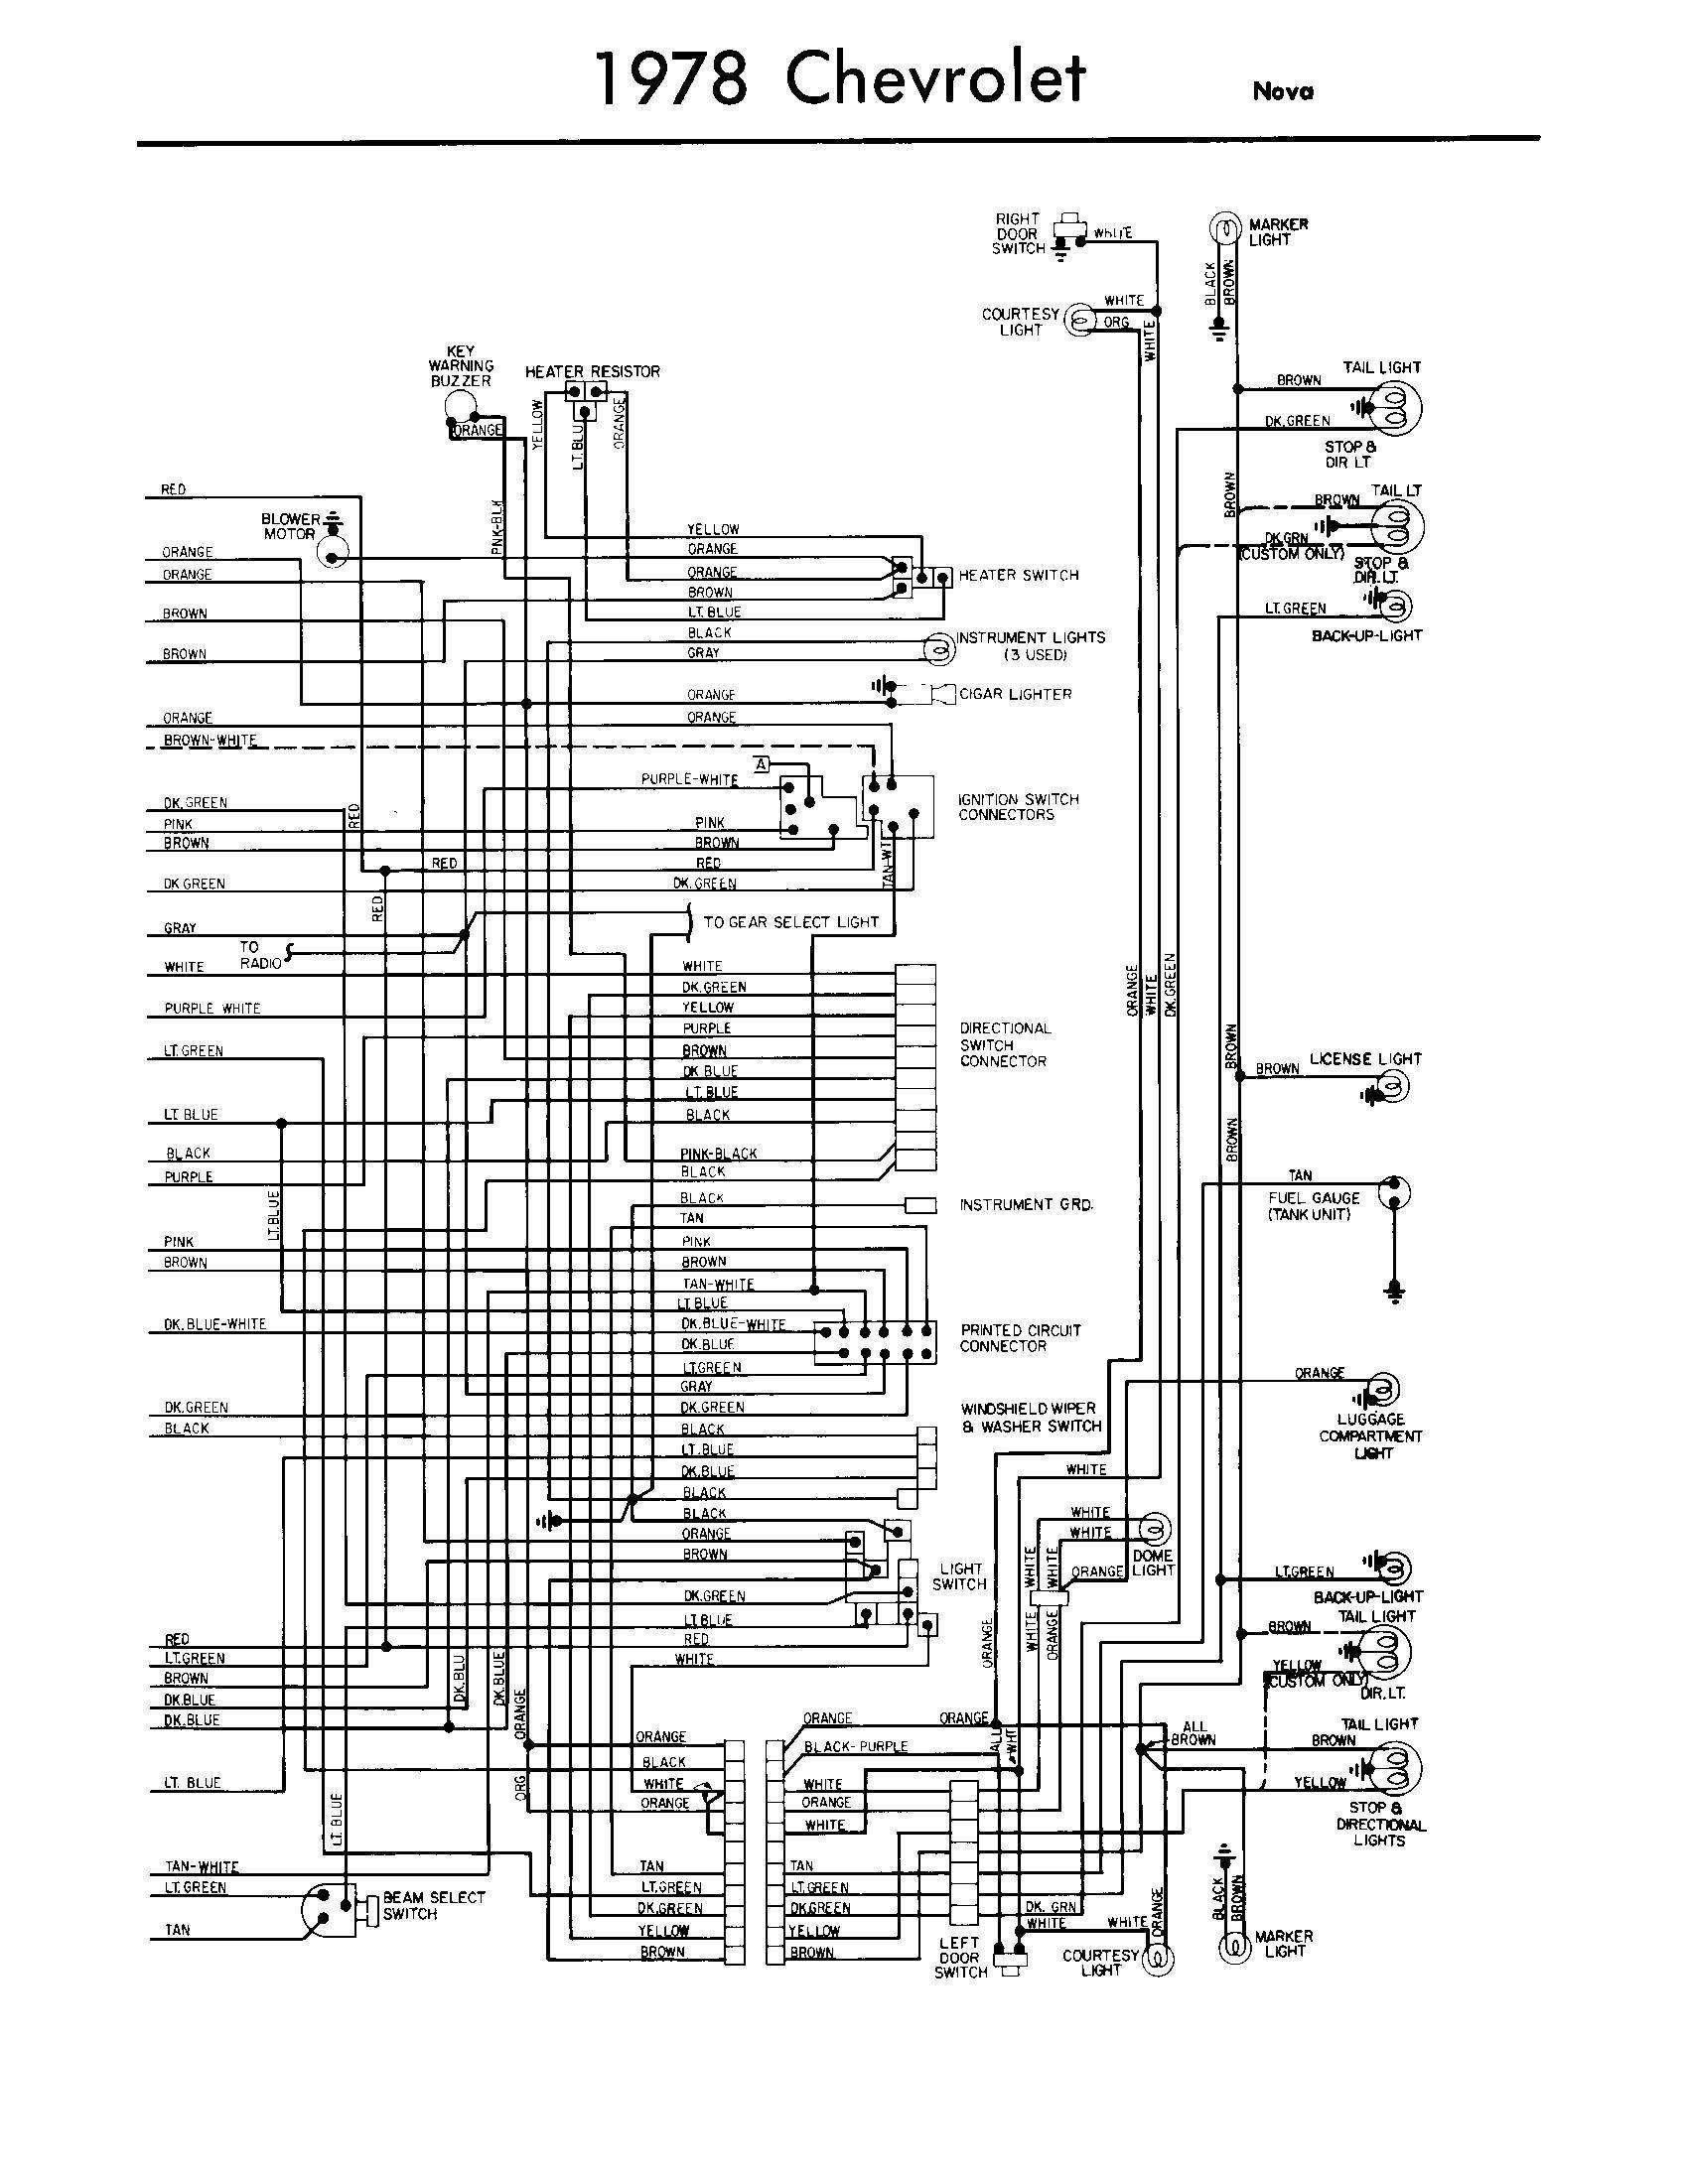 1977 Chevy Truck Vacuum Diagram 1973 Camaro Ac Wiring Diagram Another Blog About Wiring Diagram • Of 1977 Chevy Truck Vacuum Diagram